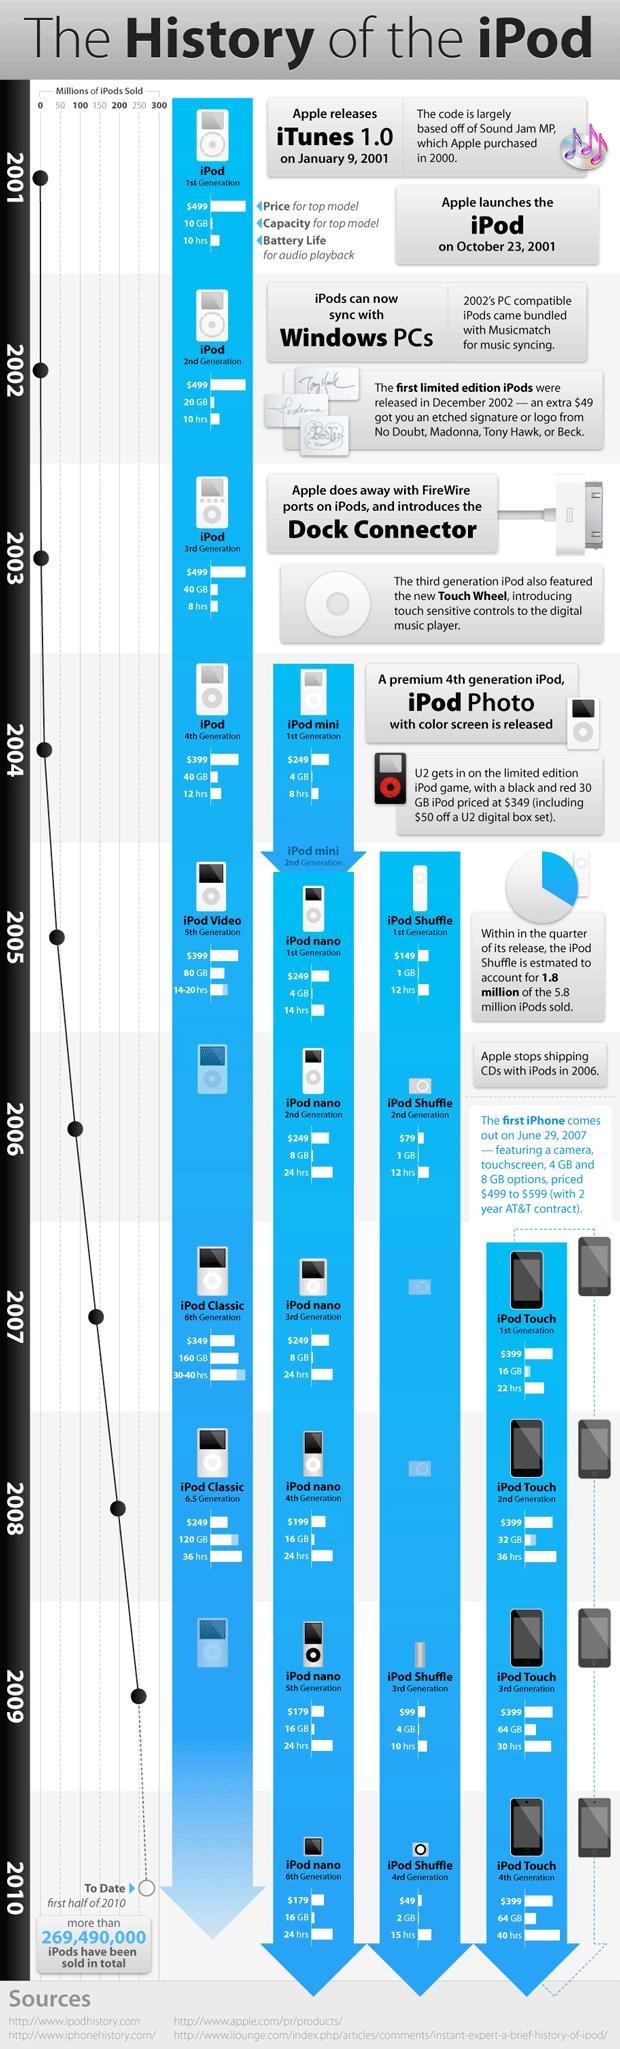 Aplicaciones, aplicaciones y más aplicaciones 8